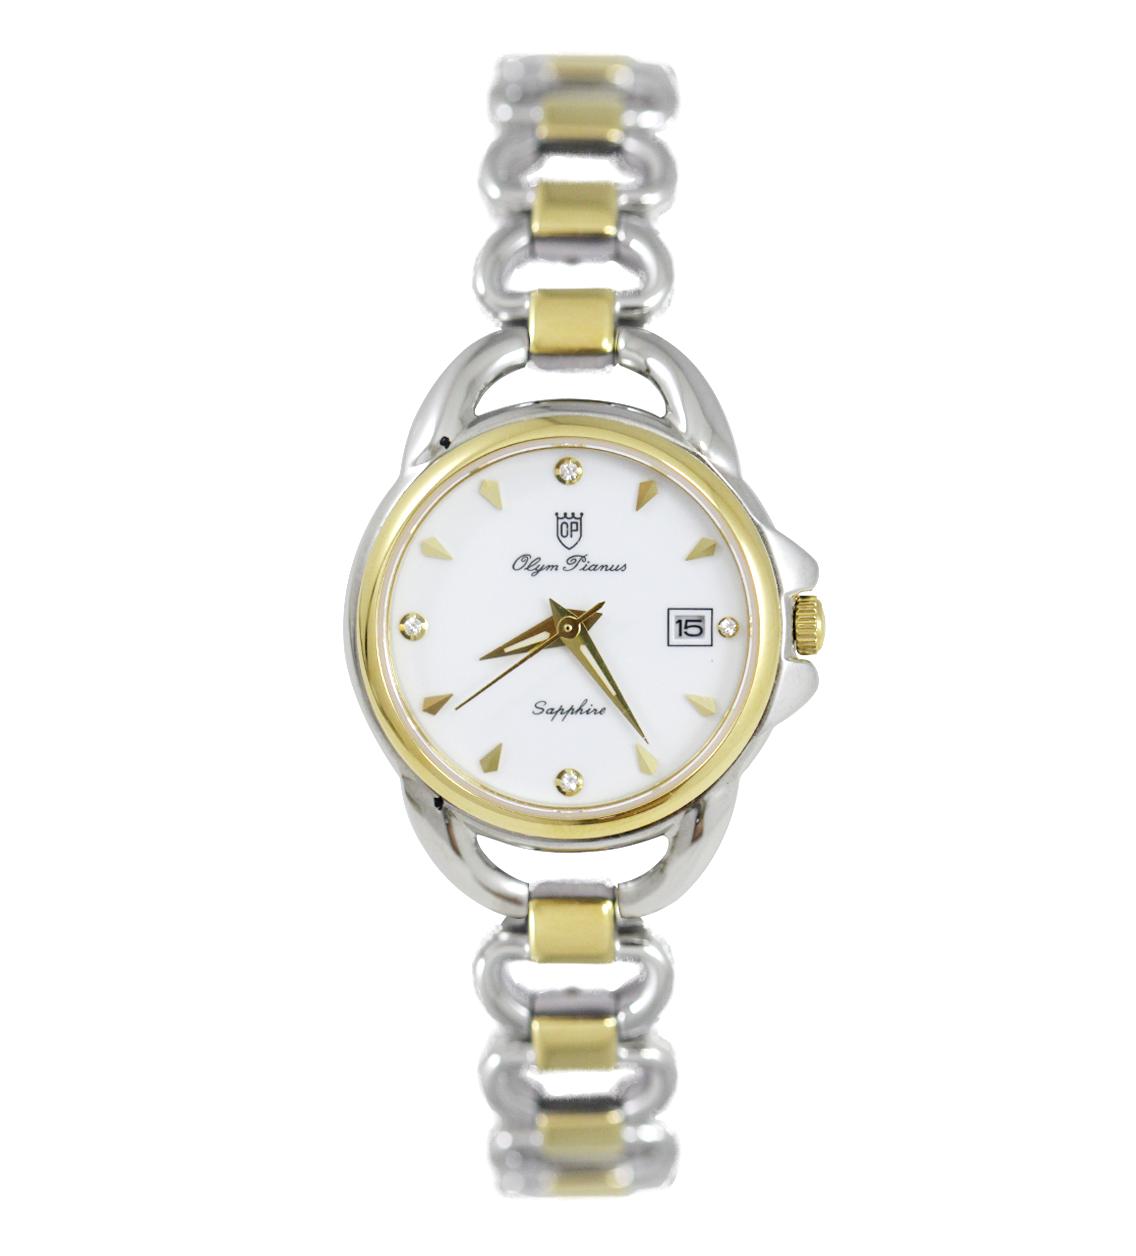 Đồng hồ nữ Olym Pianus OP2467LSK-T